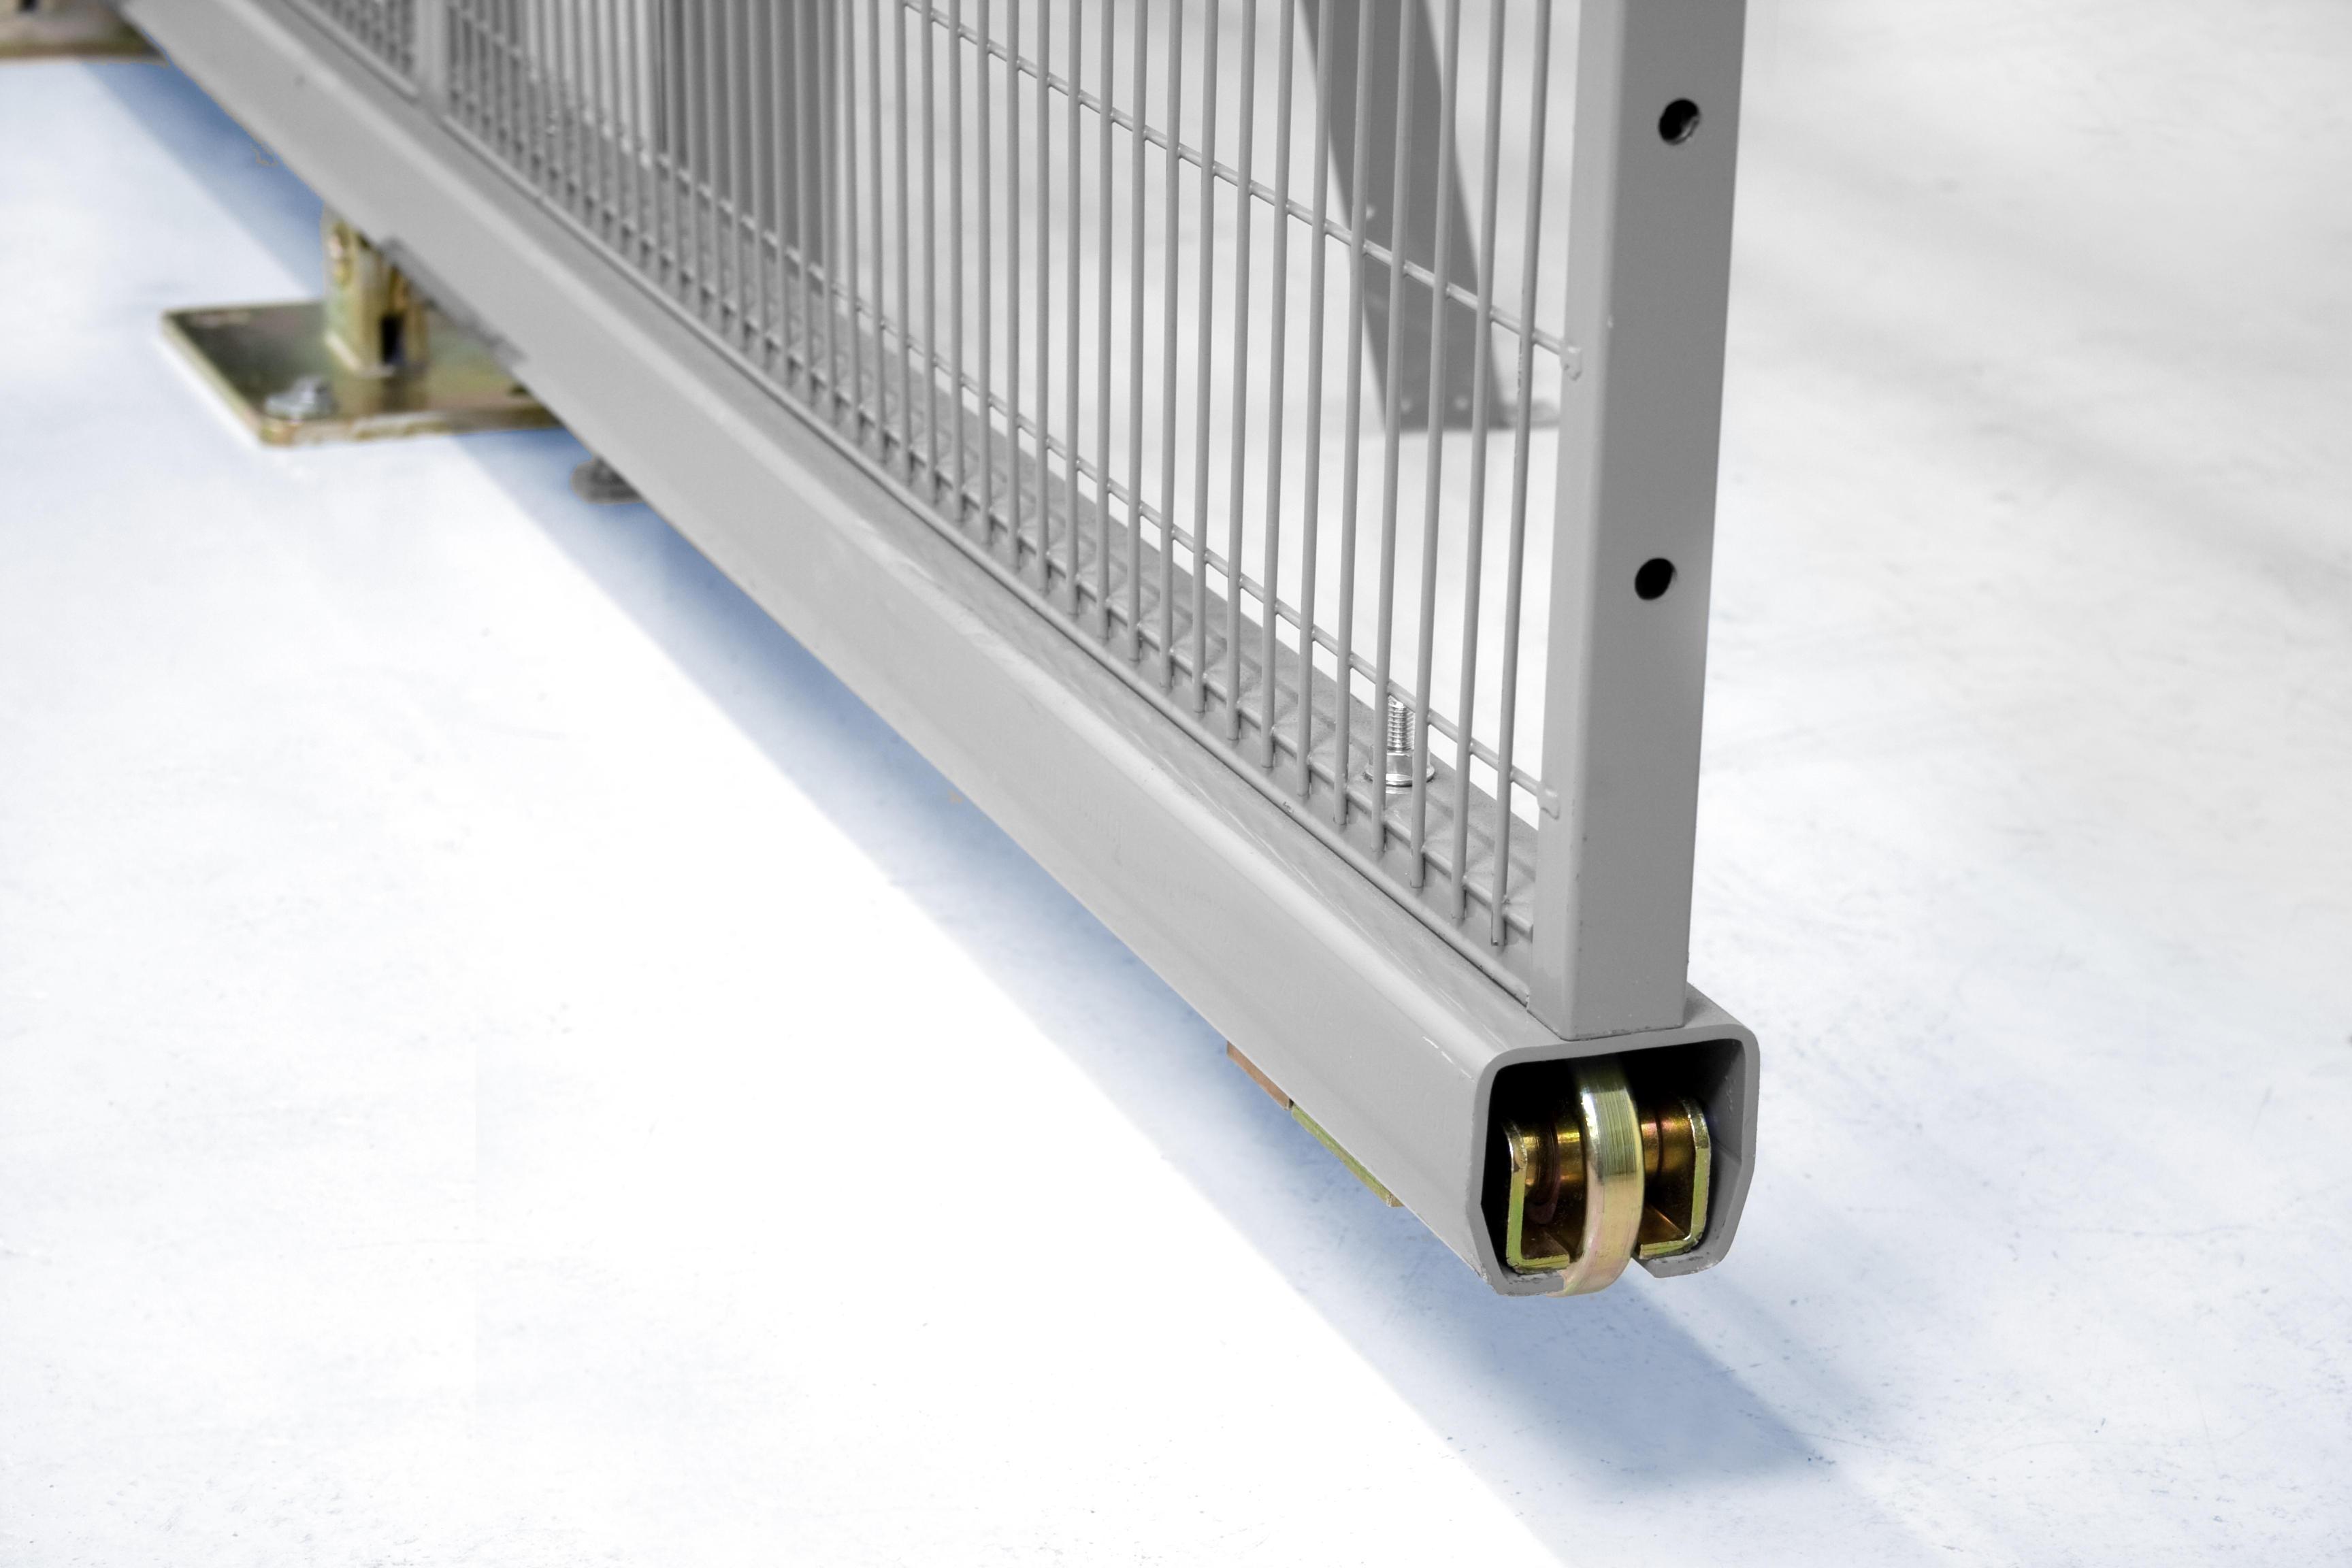 Upper Track For Sliding Screen Door3456 X 2304